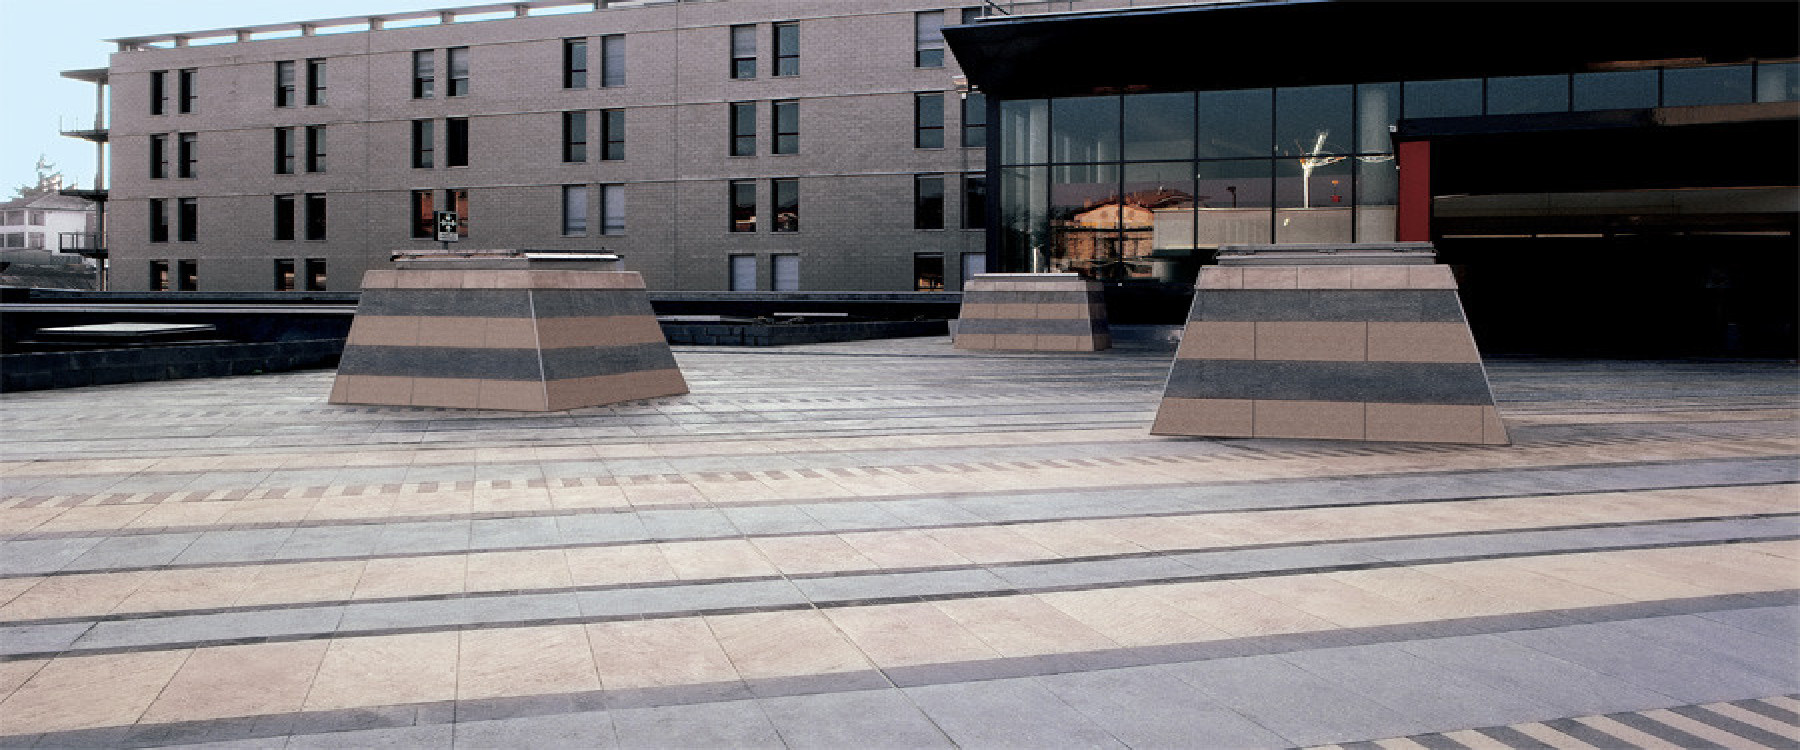 Pavimenti per esterni piastrelle sottili posa su pavimenti - Posare parquet flottante su piastrelle ...